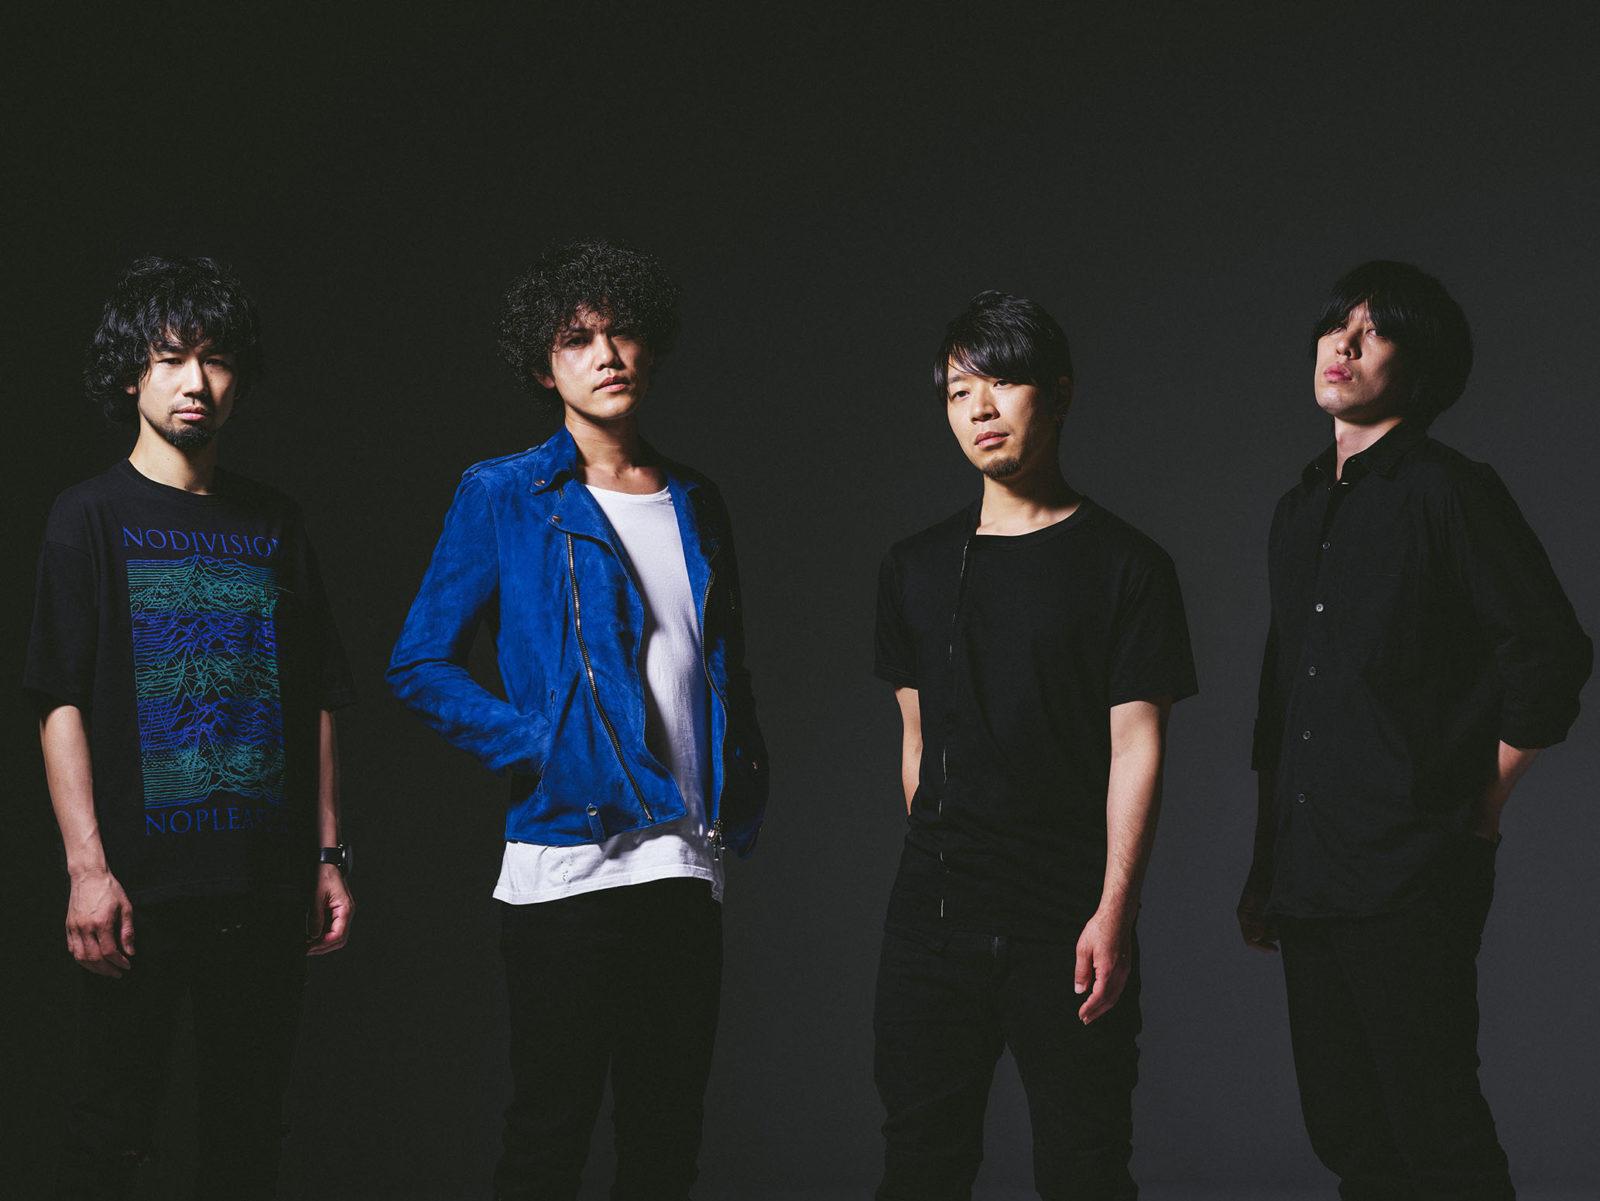 9mm Parabellum Bullet、8thアルバム「DEEP BLUE」先行全曲試聴会&トークイベントを開催サムネイル画像